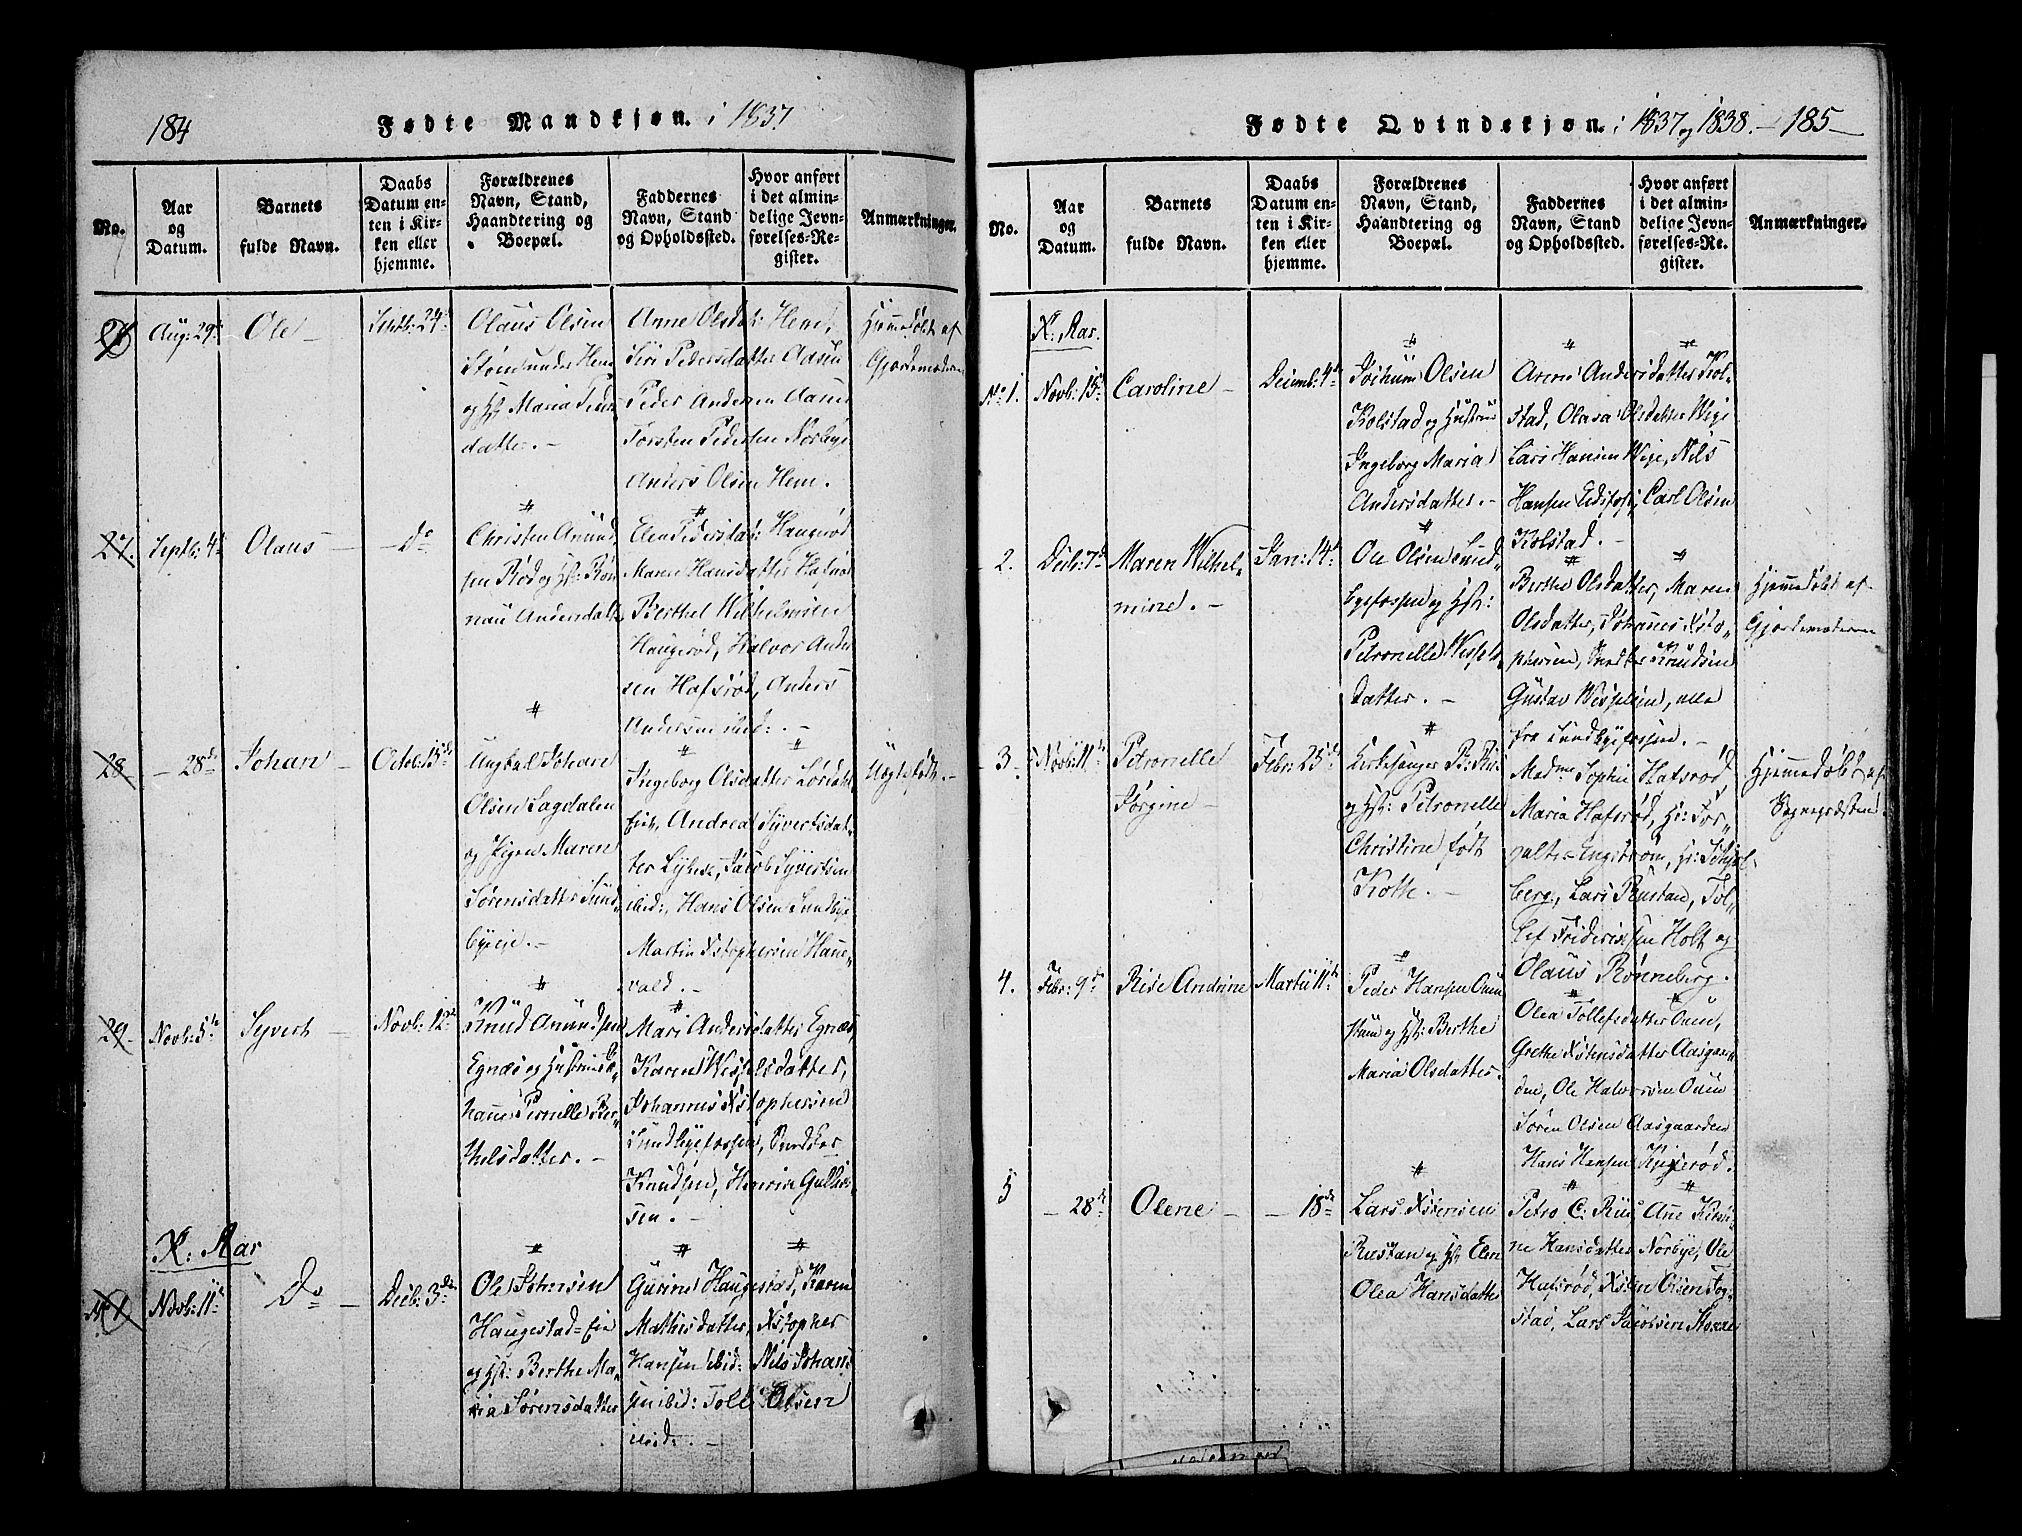 SAKO, Hof kirkebøker, F/Fa/L0004: Parish register (official) no. I 4, 1814-1843, p. 184-185